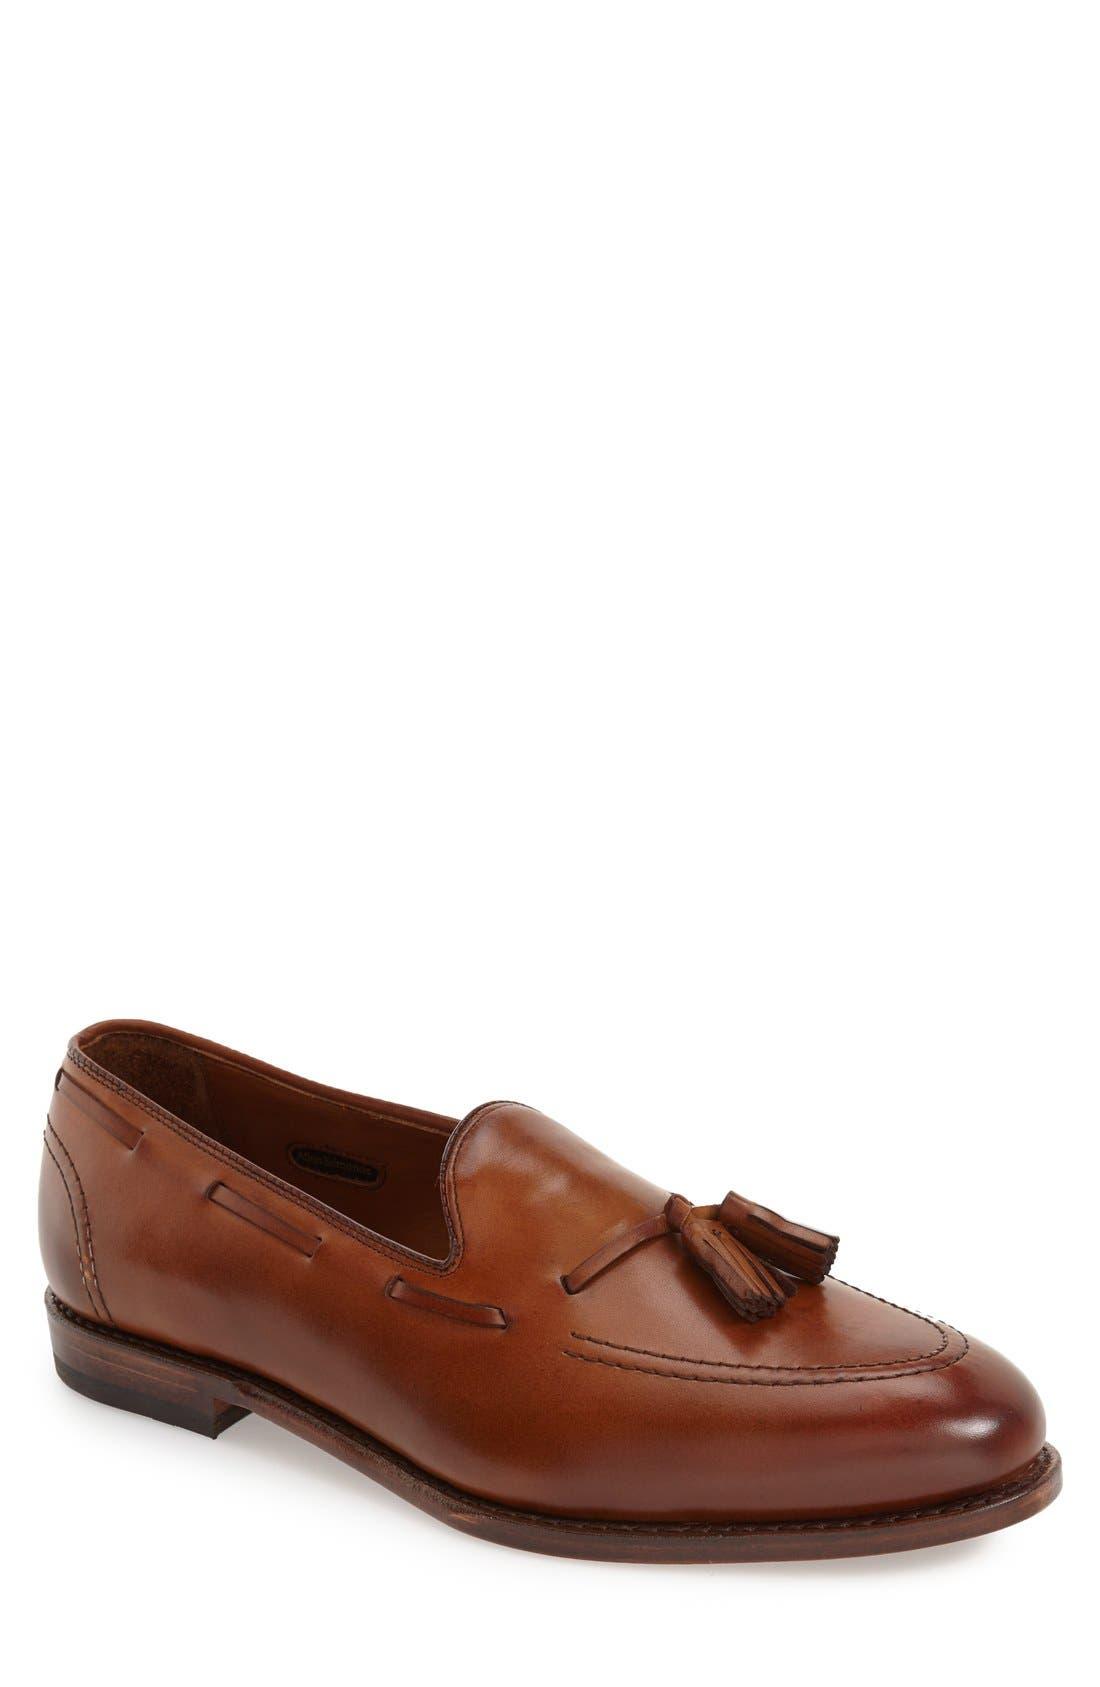 'Acheson' Tassel Loafer, Main, color, WALNUT